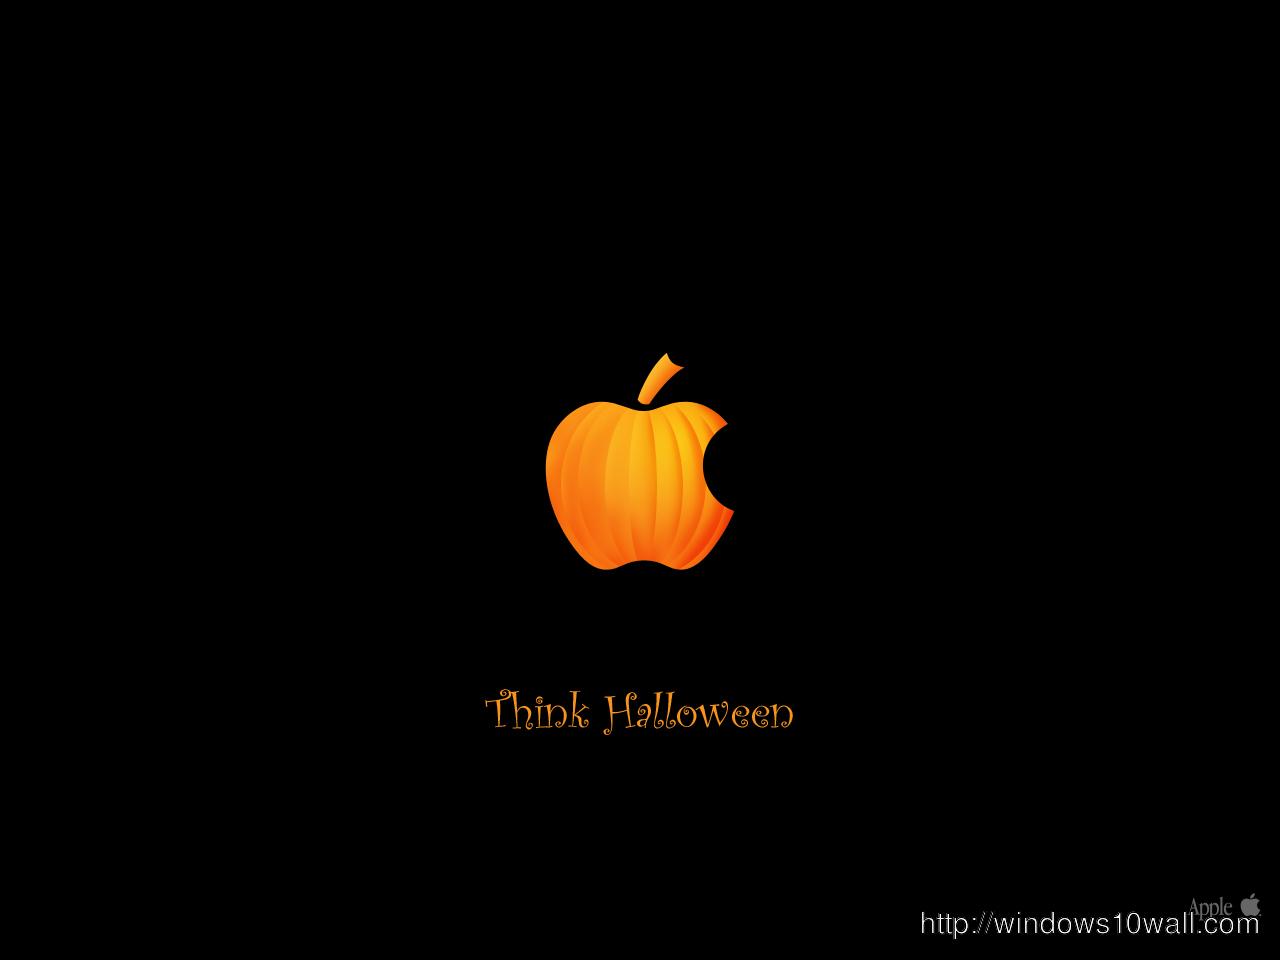 Good Wallpaper Halloween Windows 10 - apple-think-halloween-wallpaper  Pictures_457521.jpg